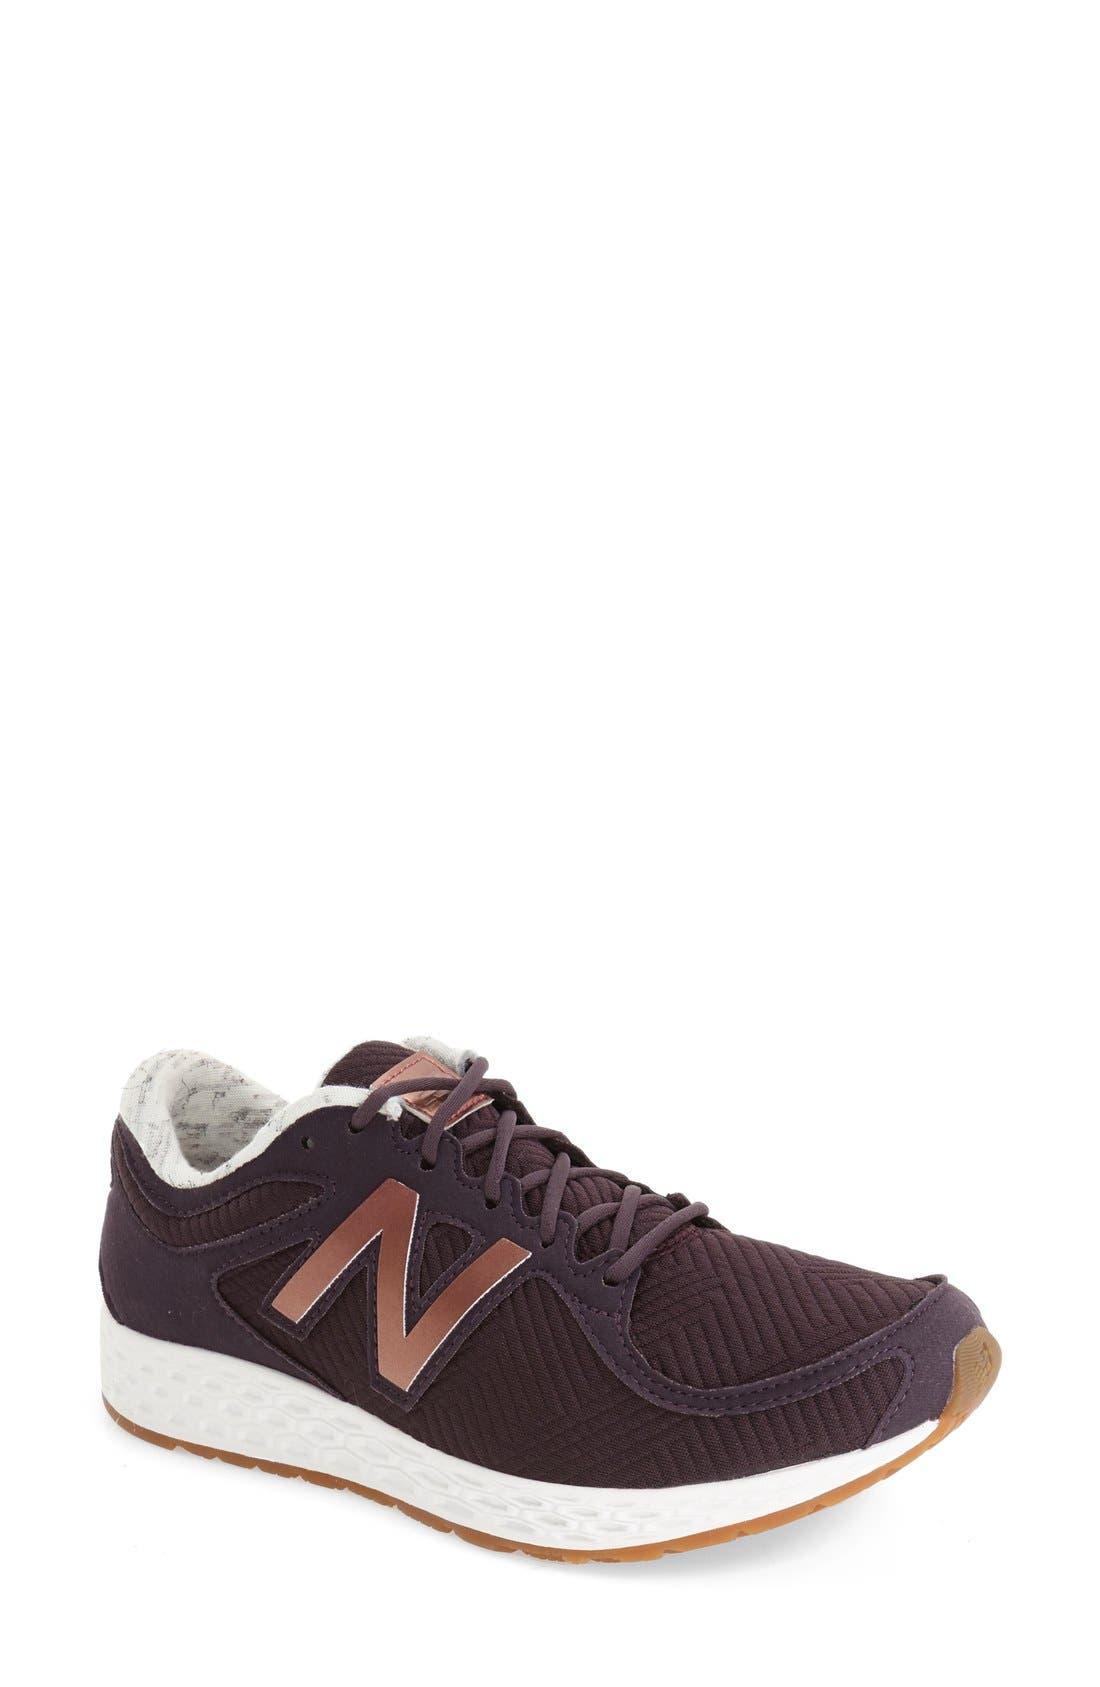 Alternate Image 1 Selected - New Balance 'Fresh Foam Zante' Sneaker (Women)